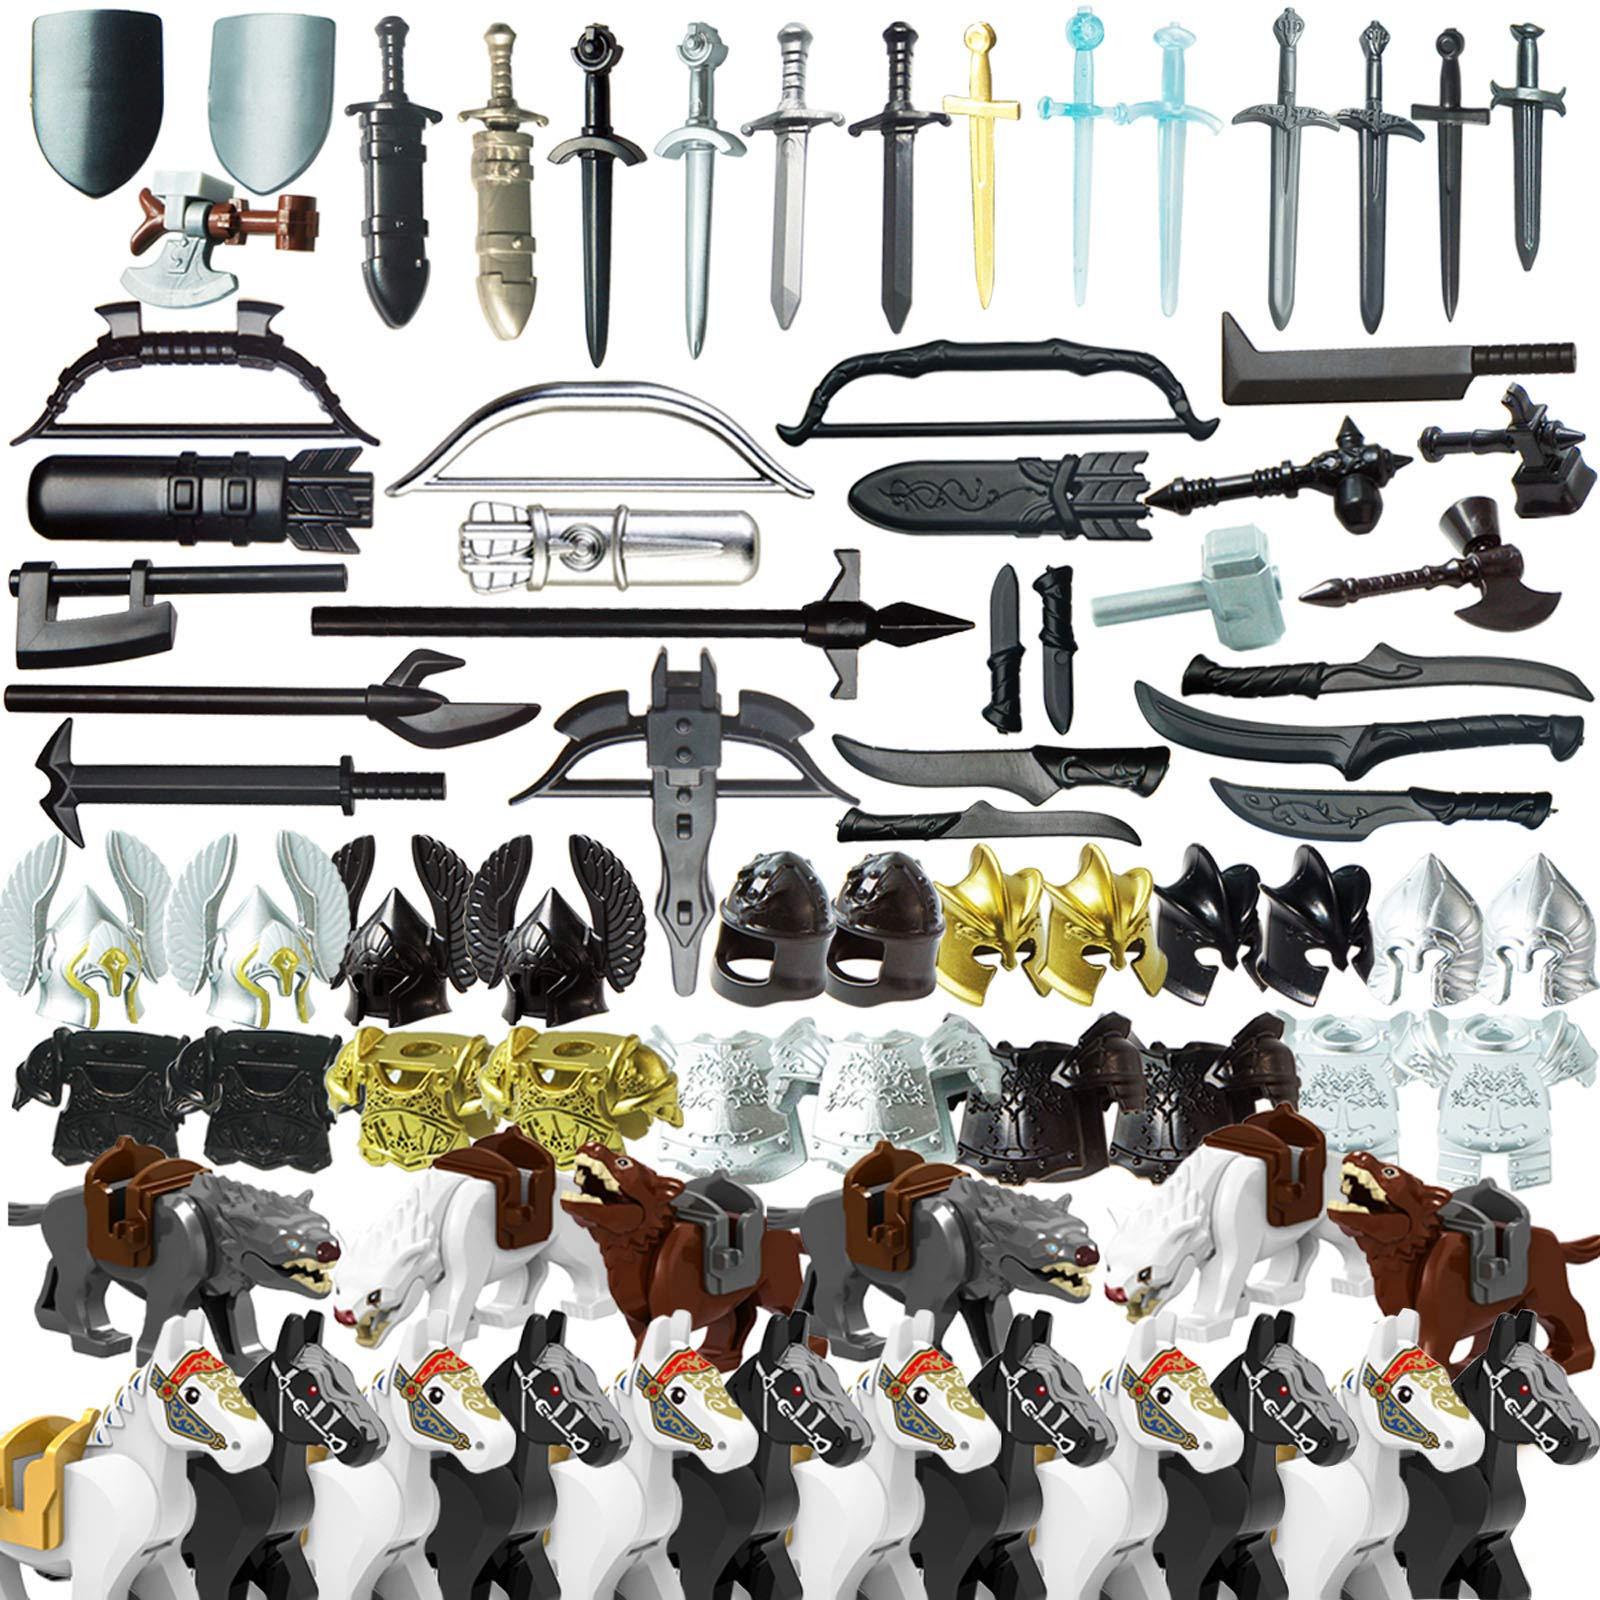 Goshfun 80Pcs Ancient Greek Ancient Roman Medieval Figure Weapon Armor Set, Small Particle Building Block Toy Kit